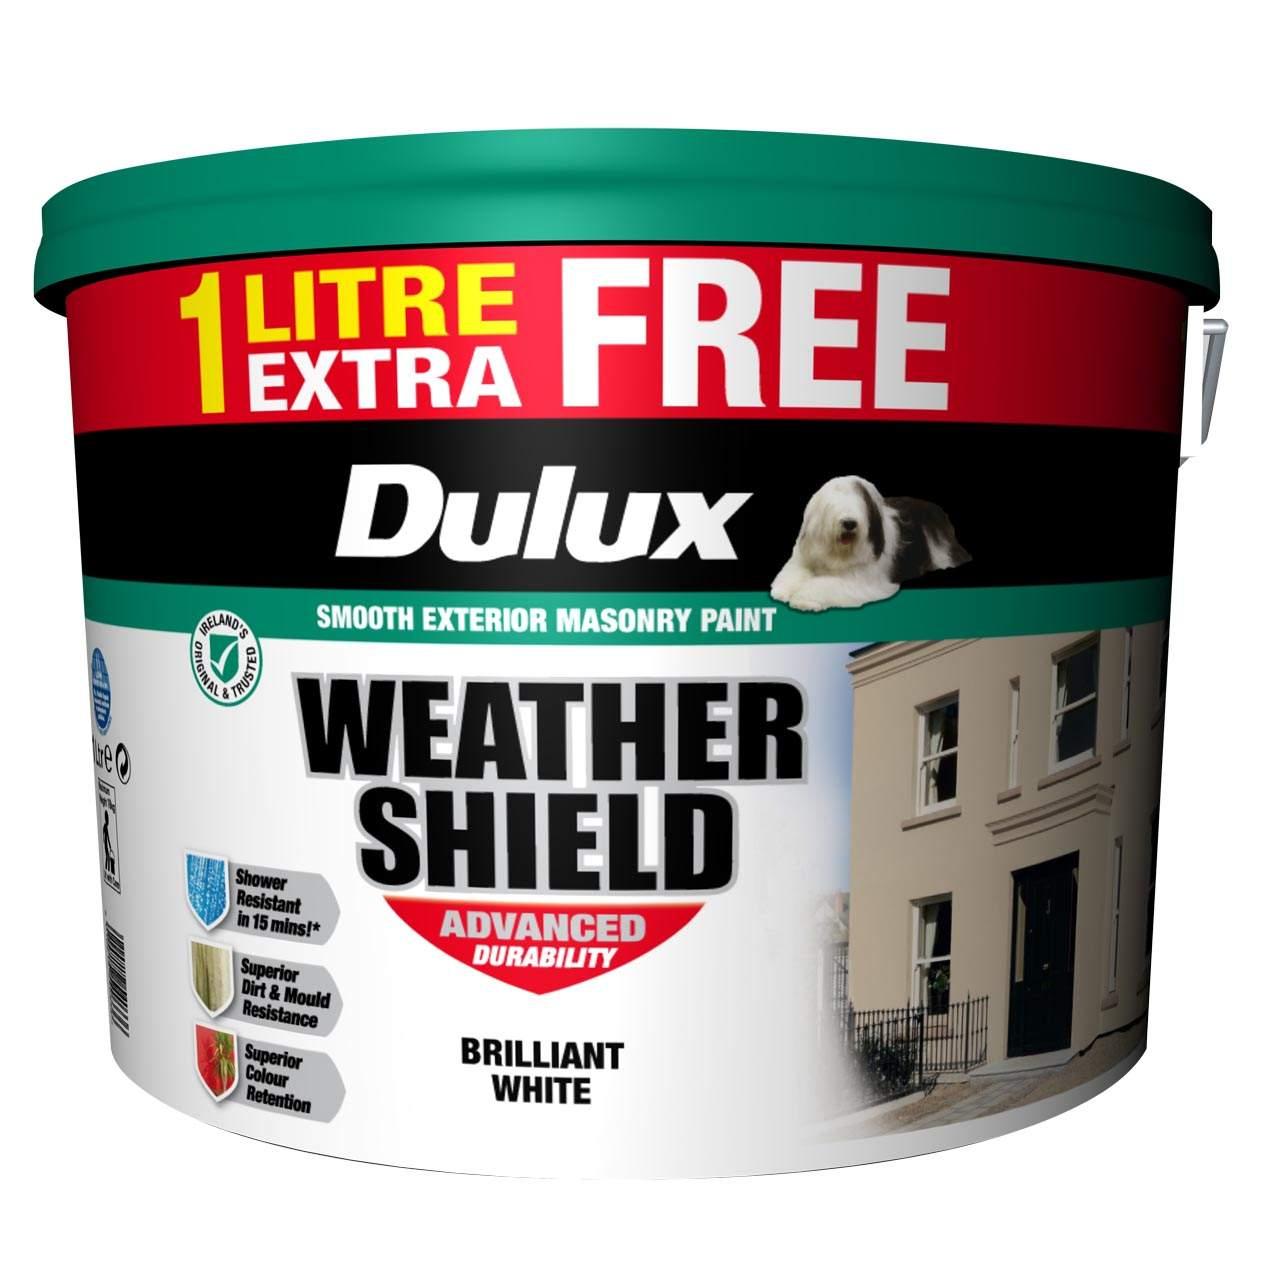 Dulux weathershield paint white magnolia homeland stores - Weathershield exterior paint system ...